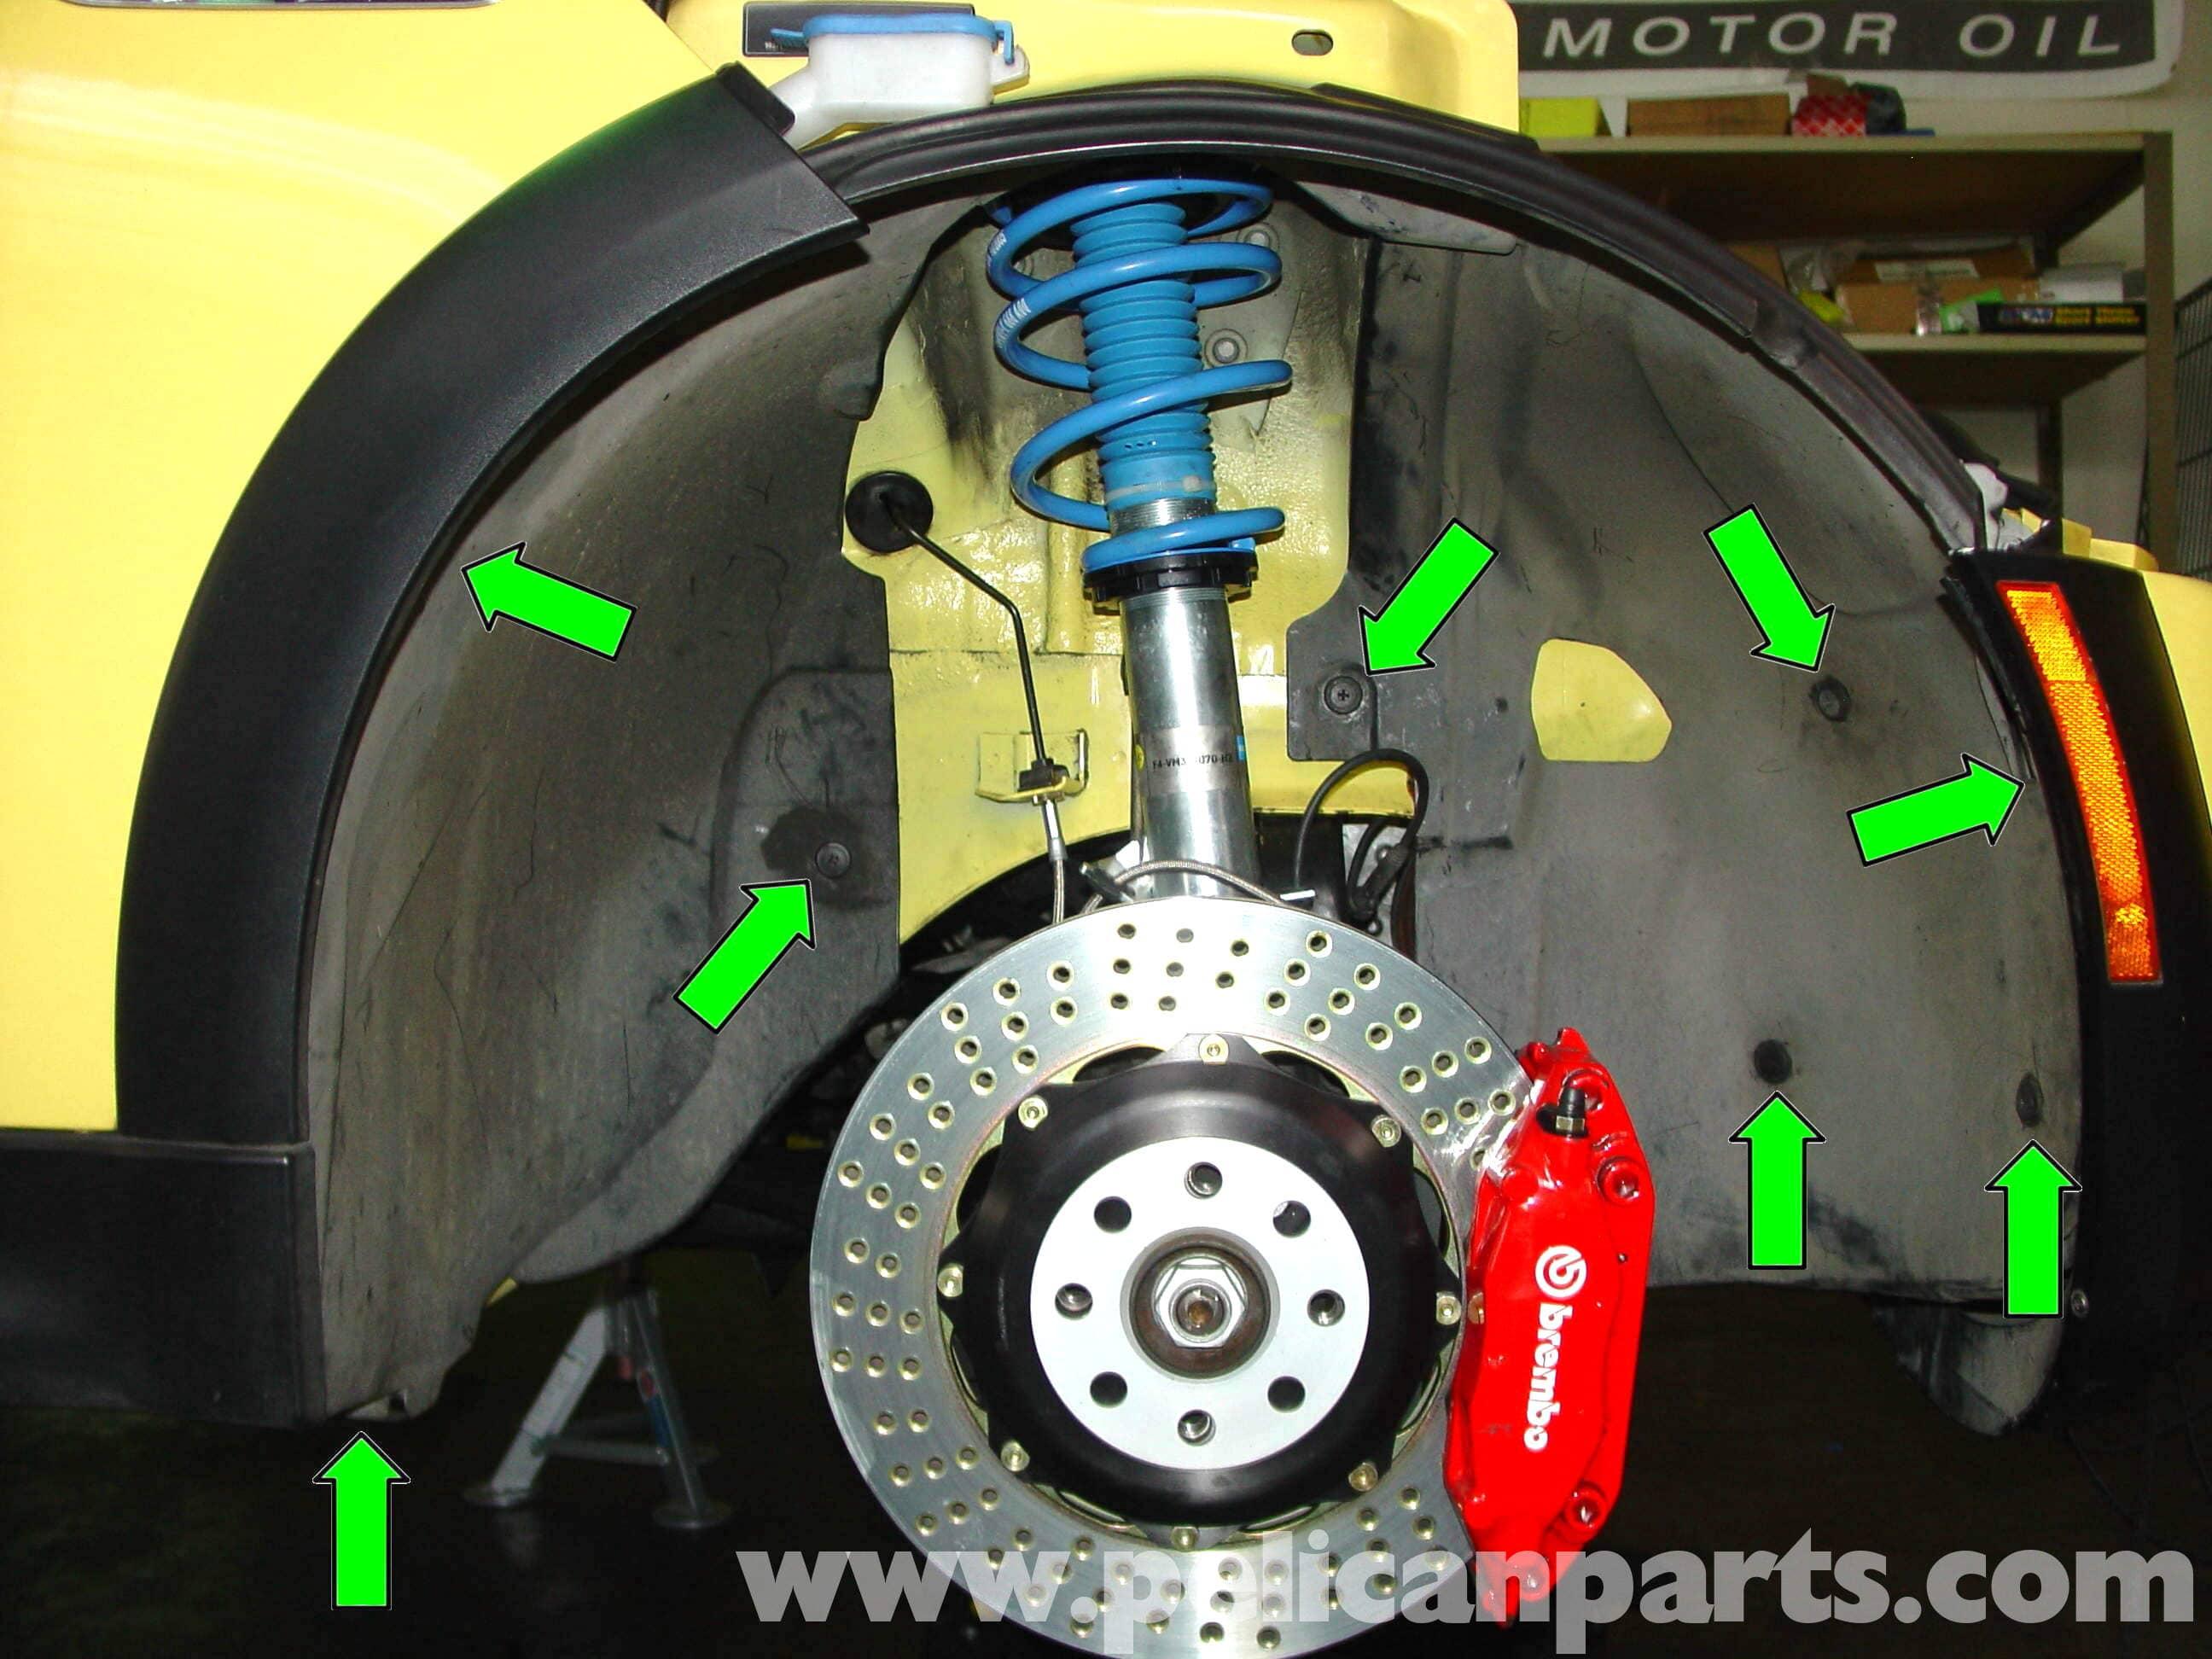 MINI Cooper Lens And Bulb Replacement RRR - 03 mini cooper s wiring diagram